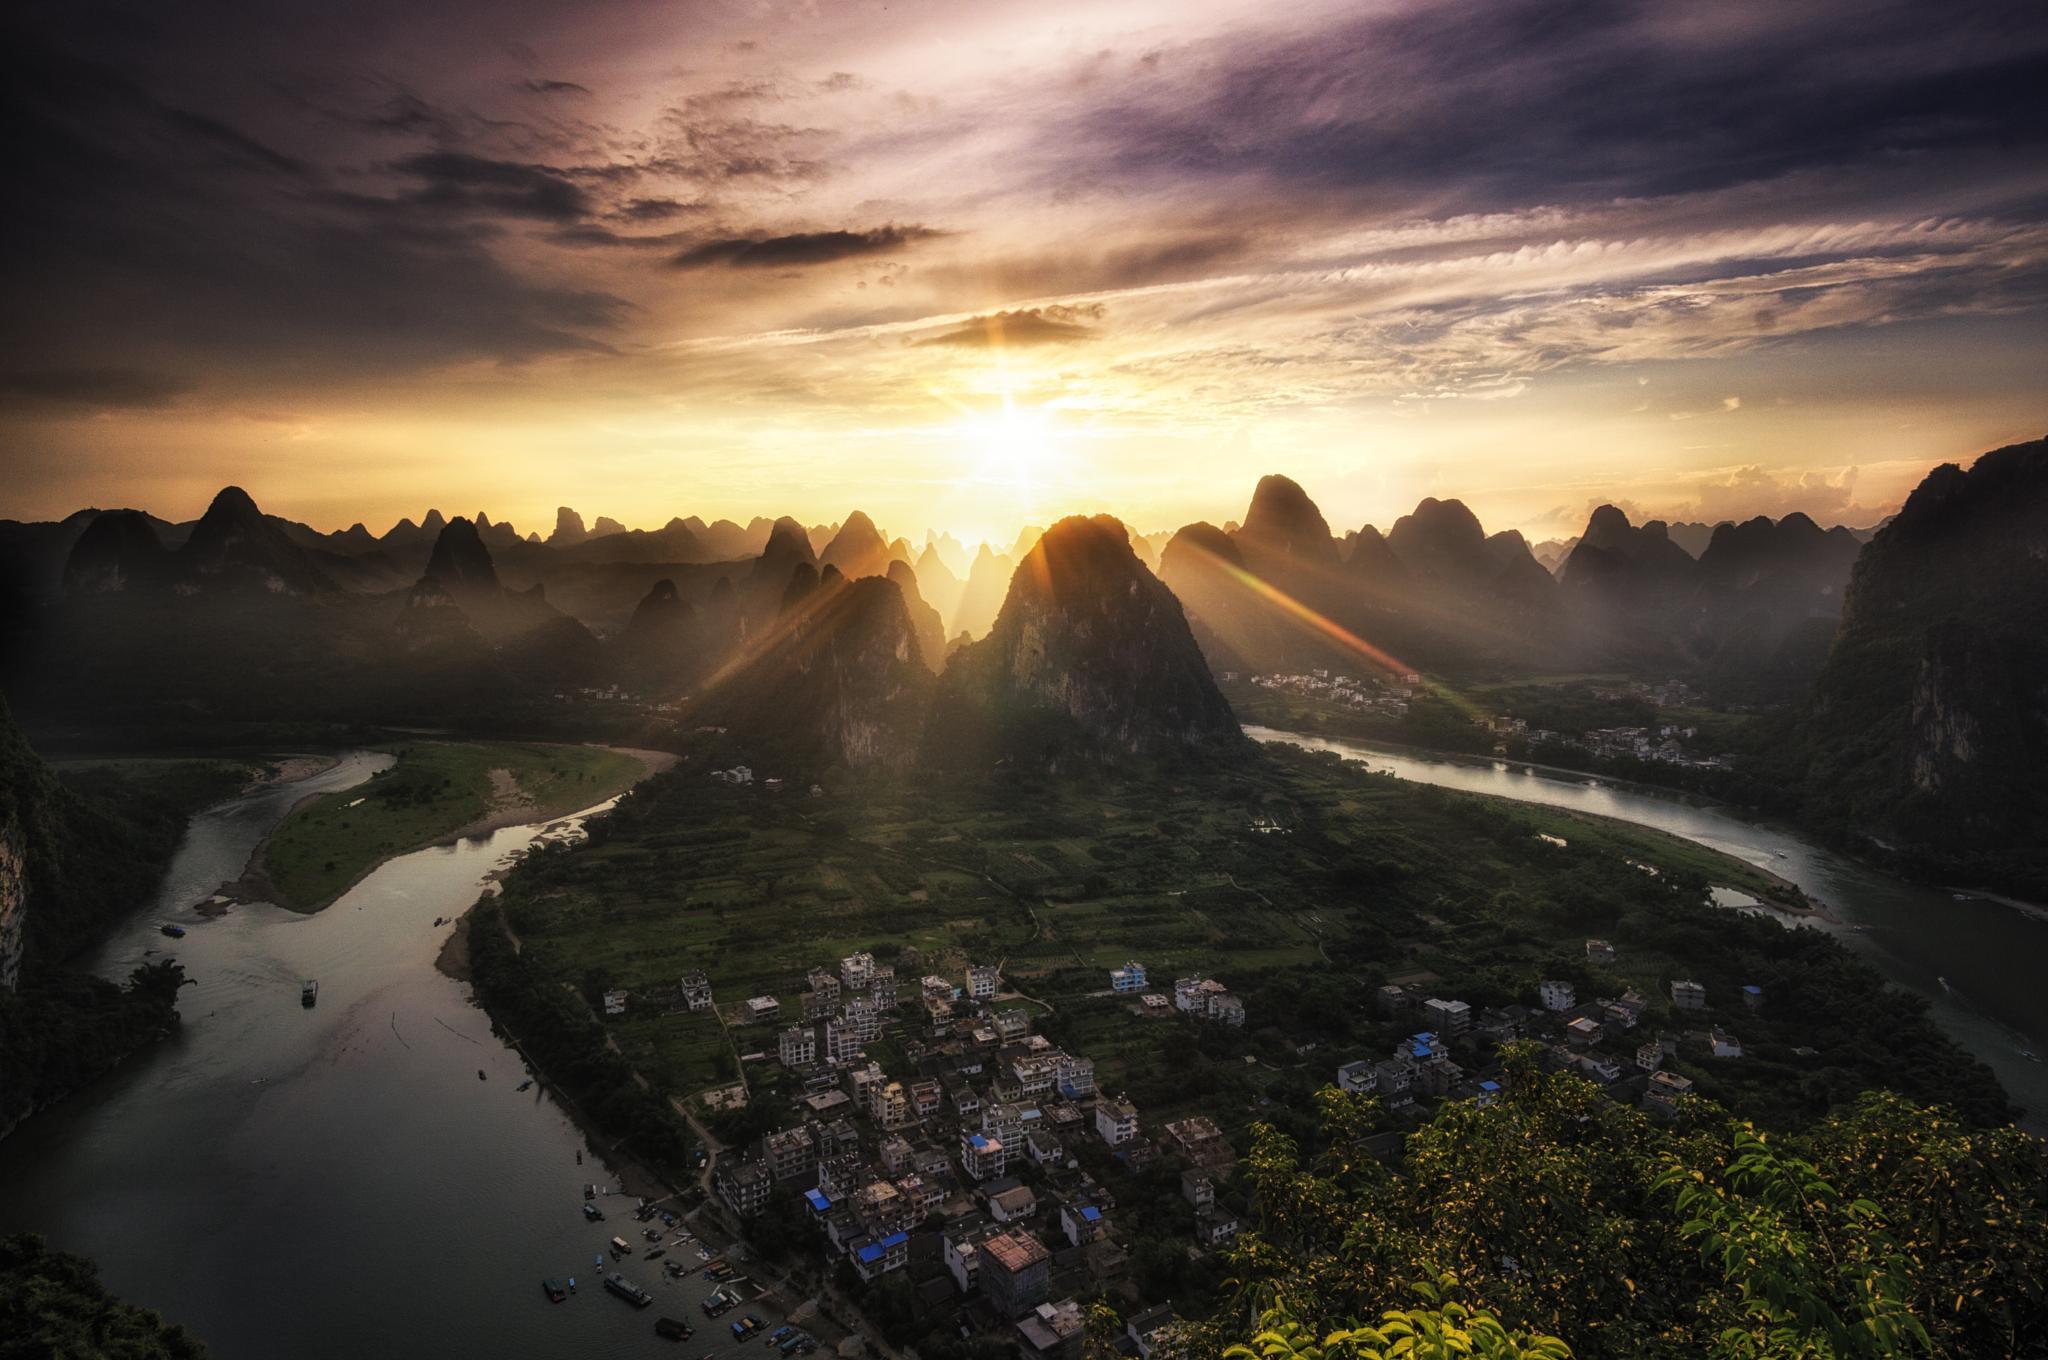 Laozhai Sunset by Aaron Choi